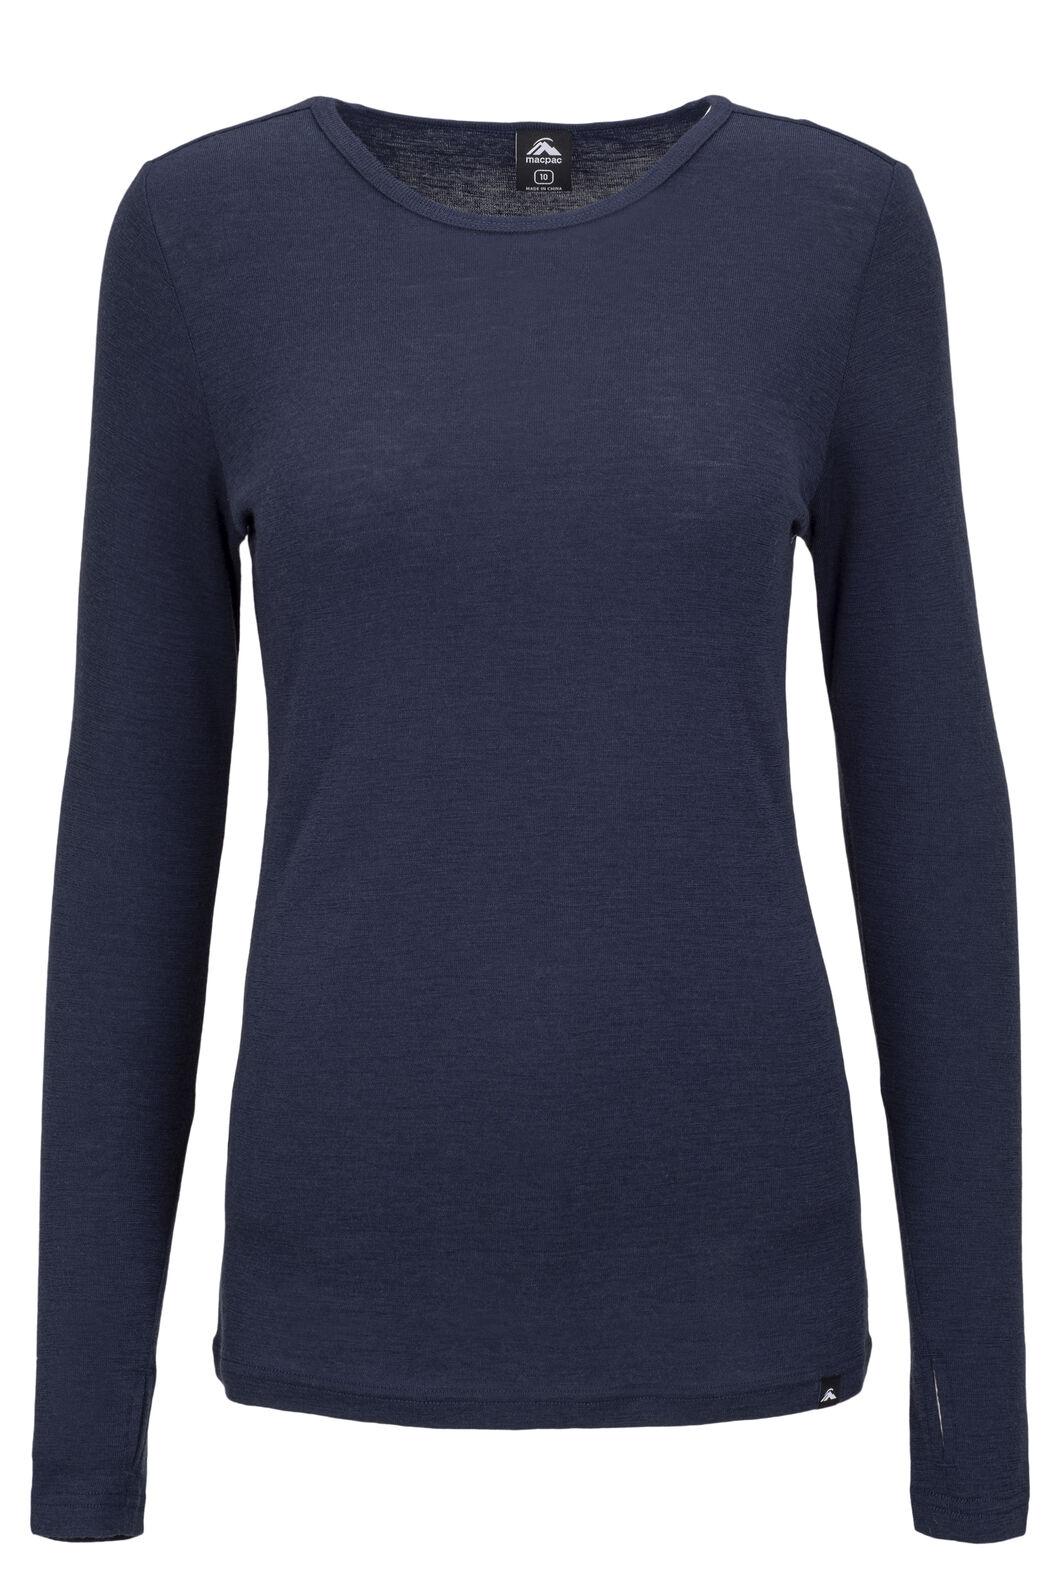 Macpac Women's 220 Merino Long Sleeve Top, Black Iris, hi-res